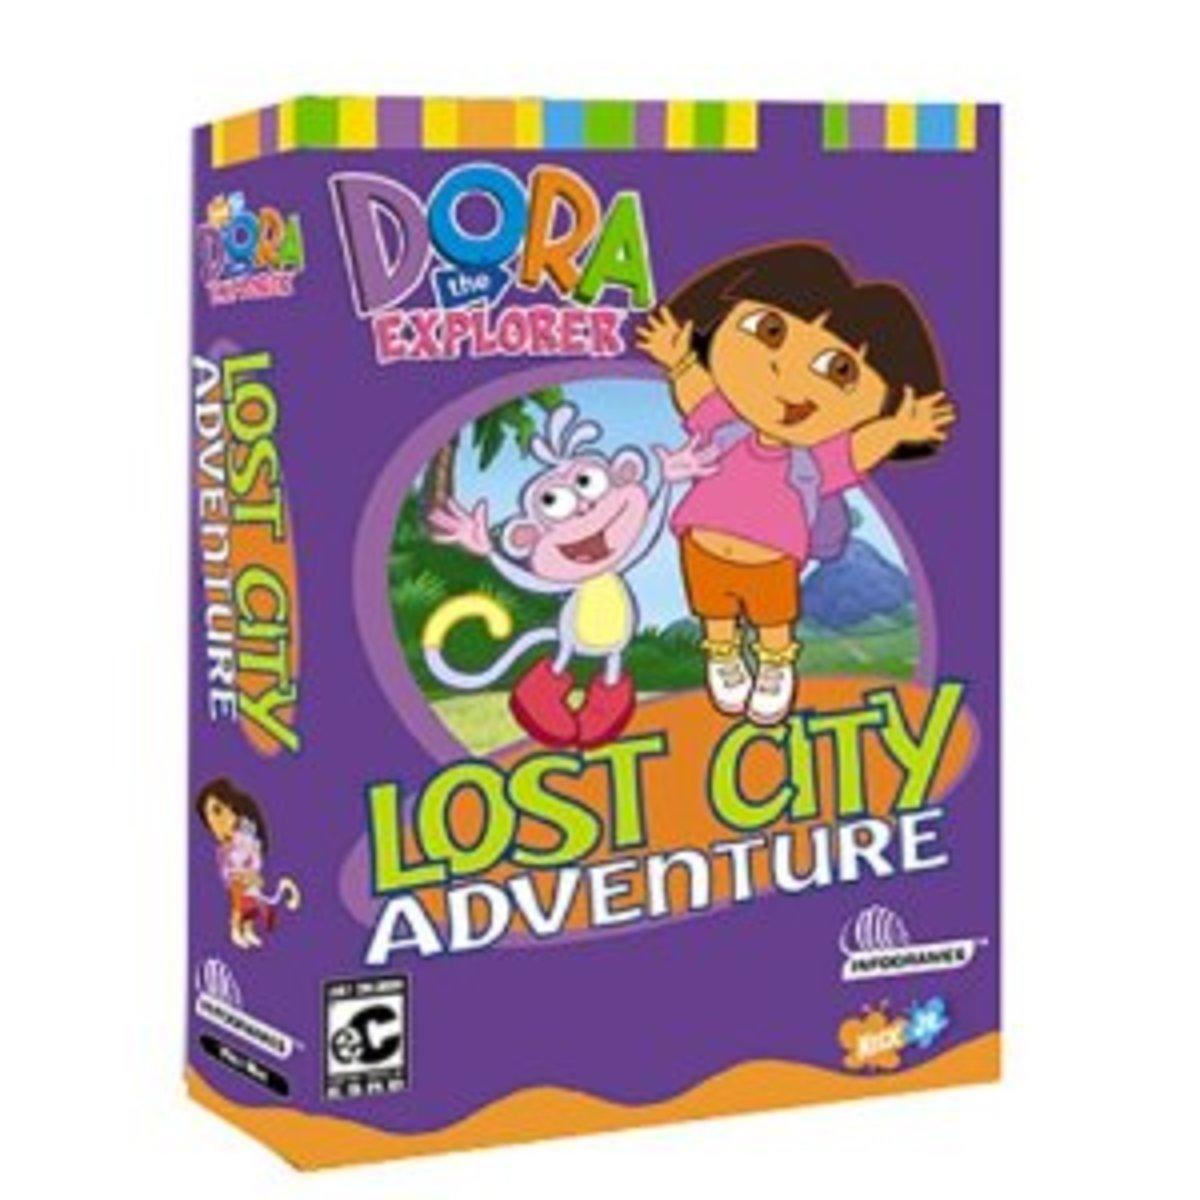 Dora the Explorer: Lost City Adventure game cover